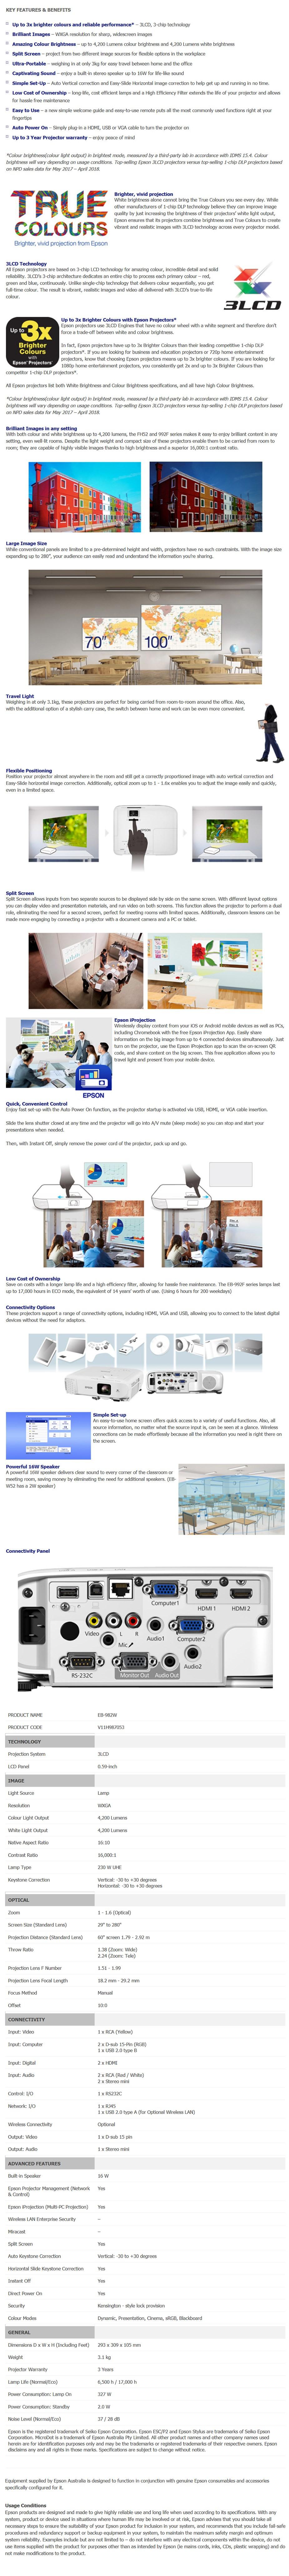 epson-eb982w-wxga-3lcd-corporate-portable-multimedia-projector-ac38566-4.jpg